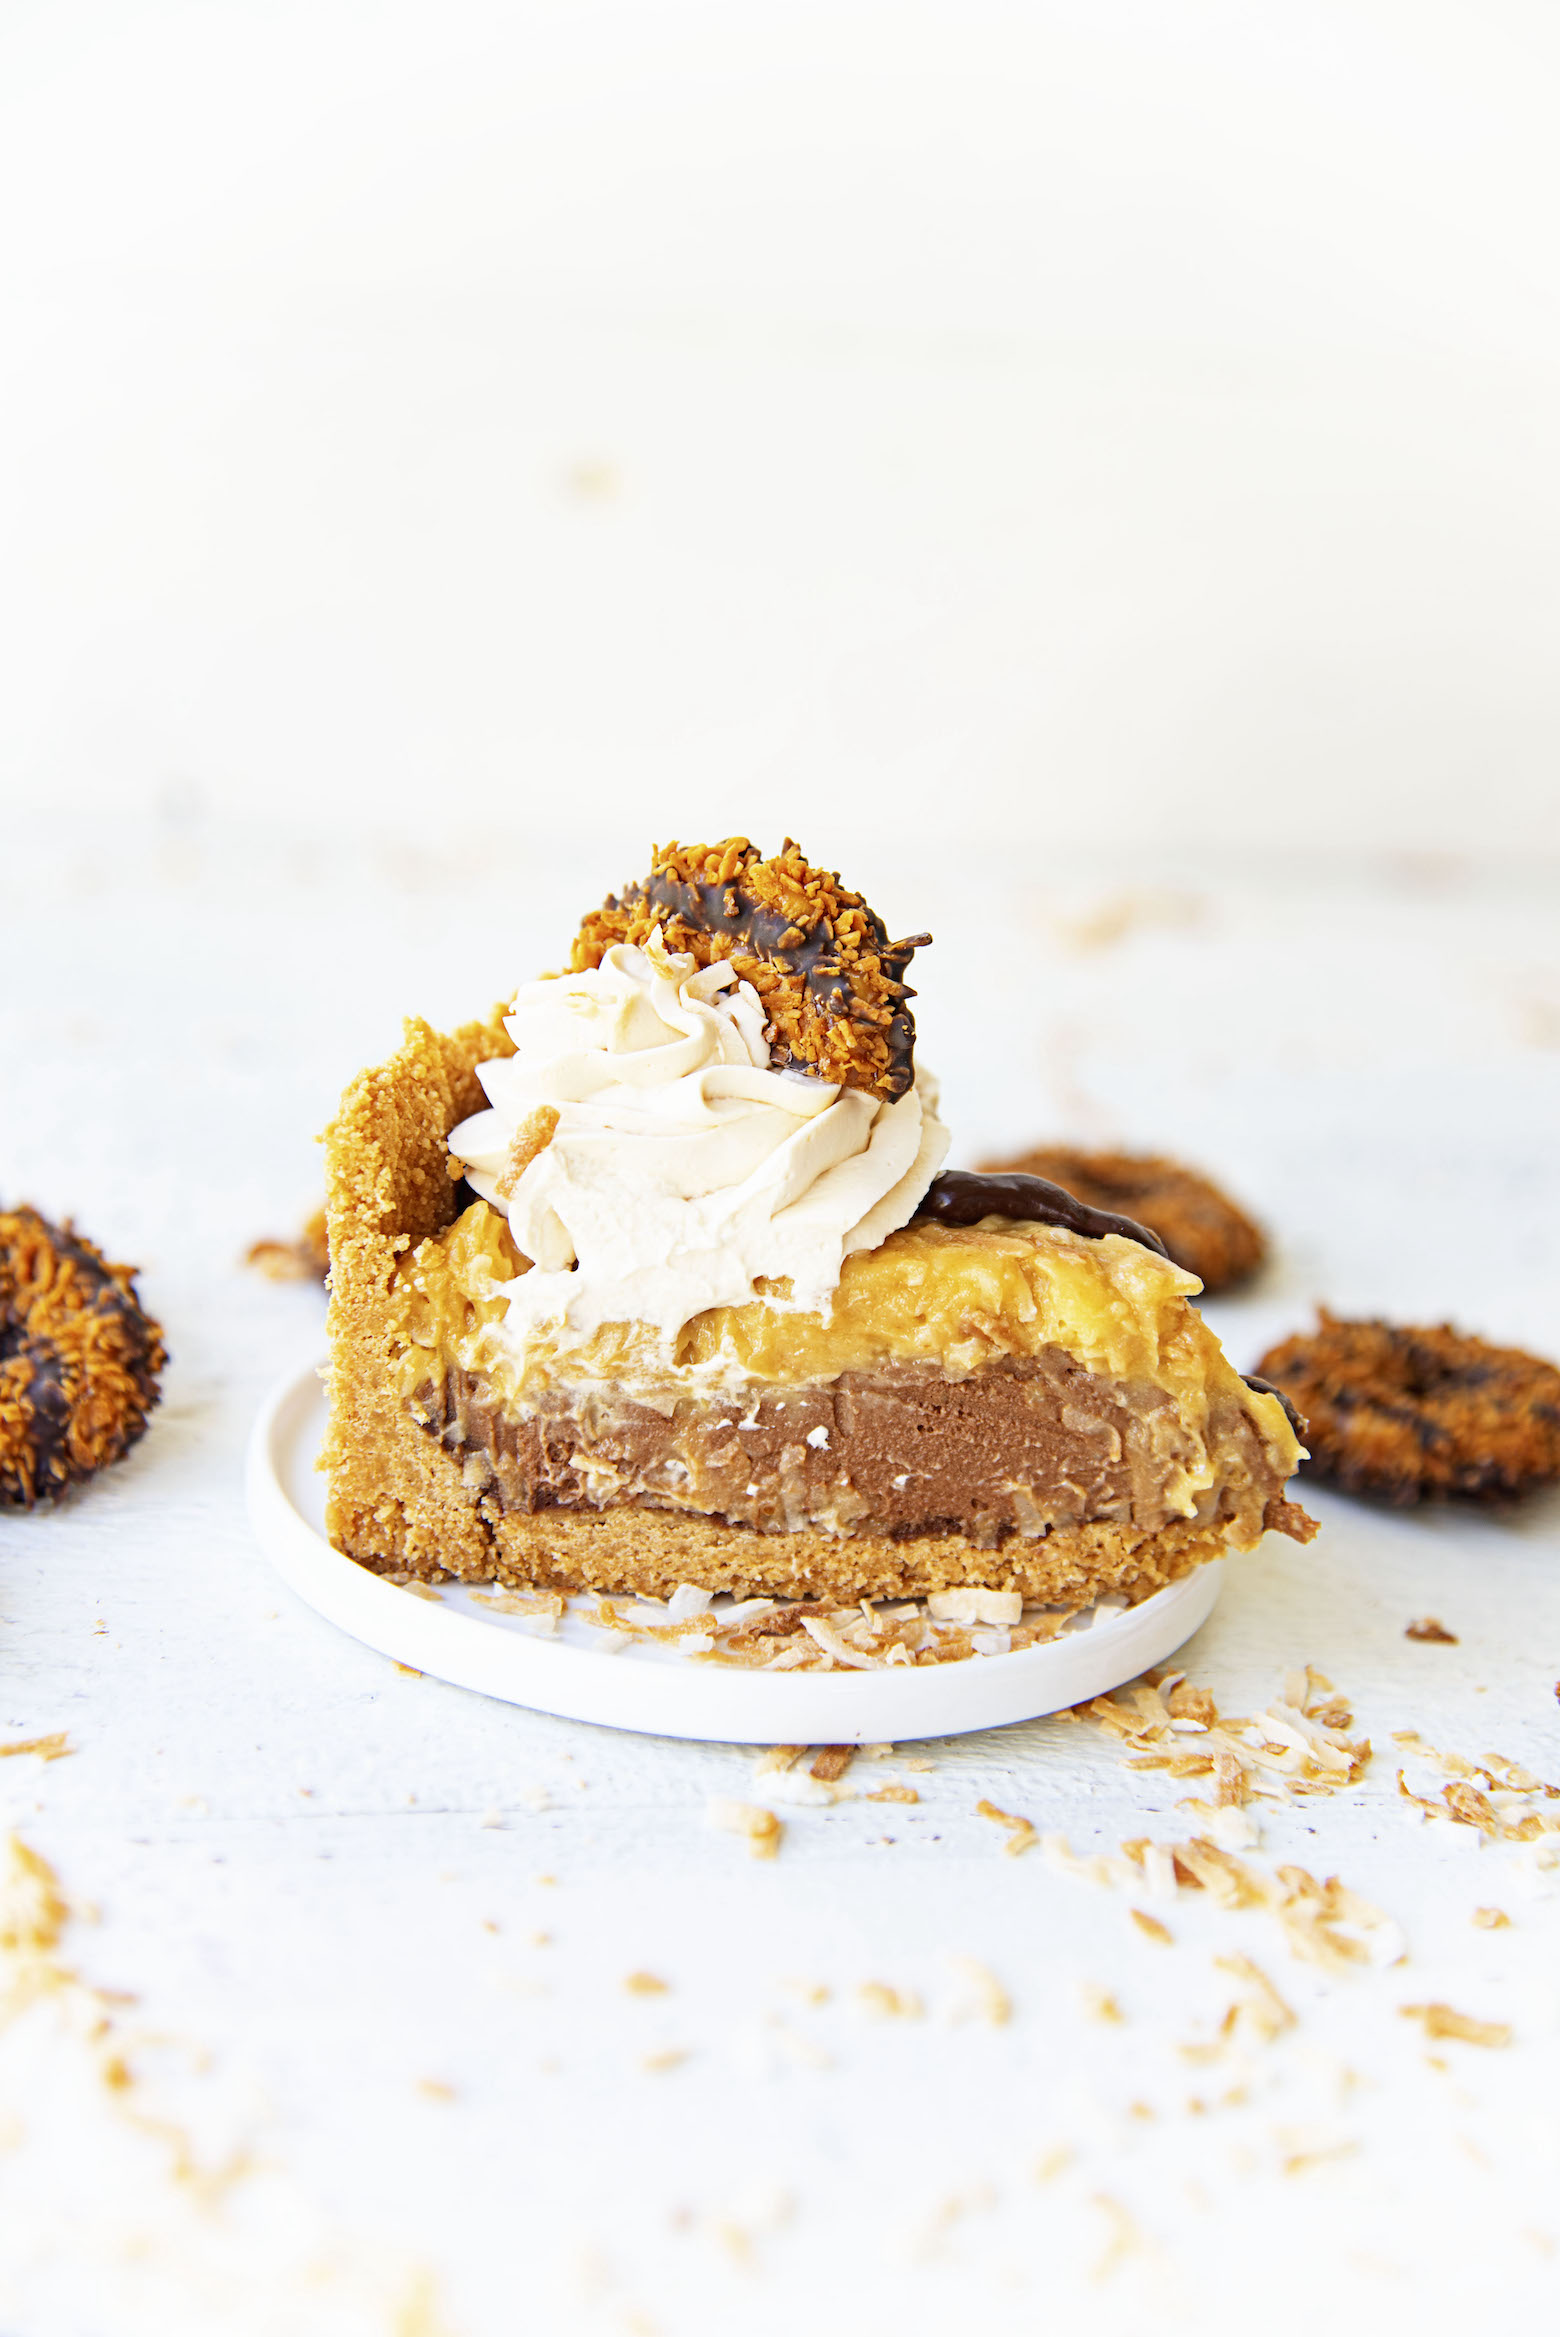 Single slice of the Samoas Chocolate Coconut Cream Pie.